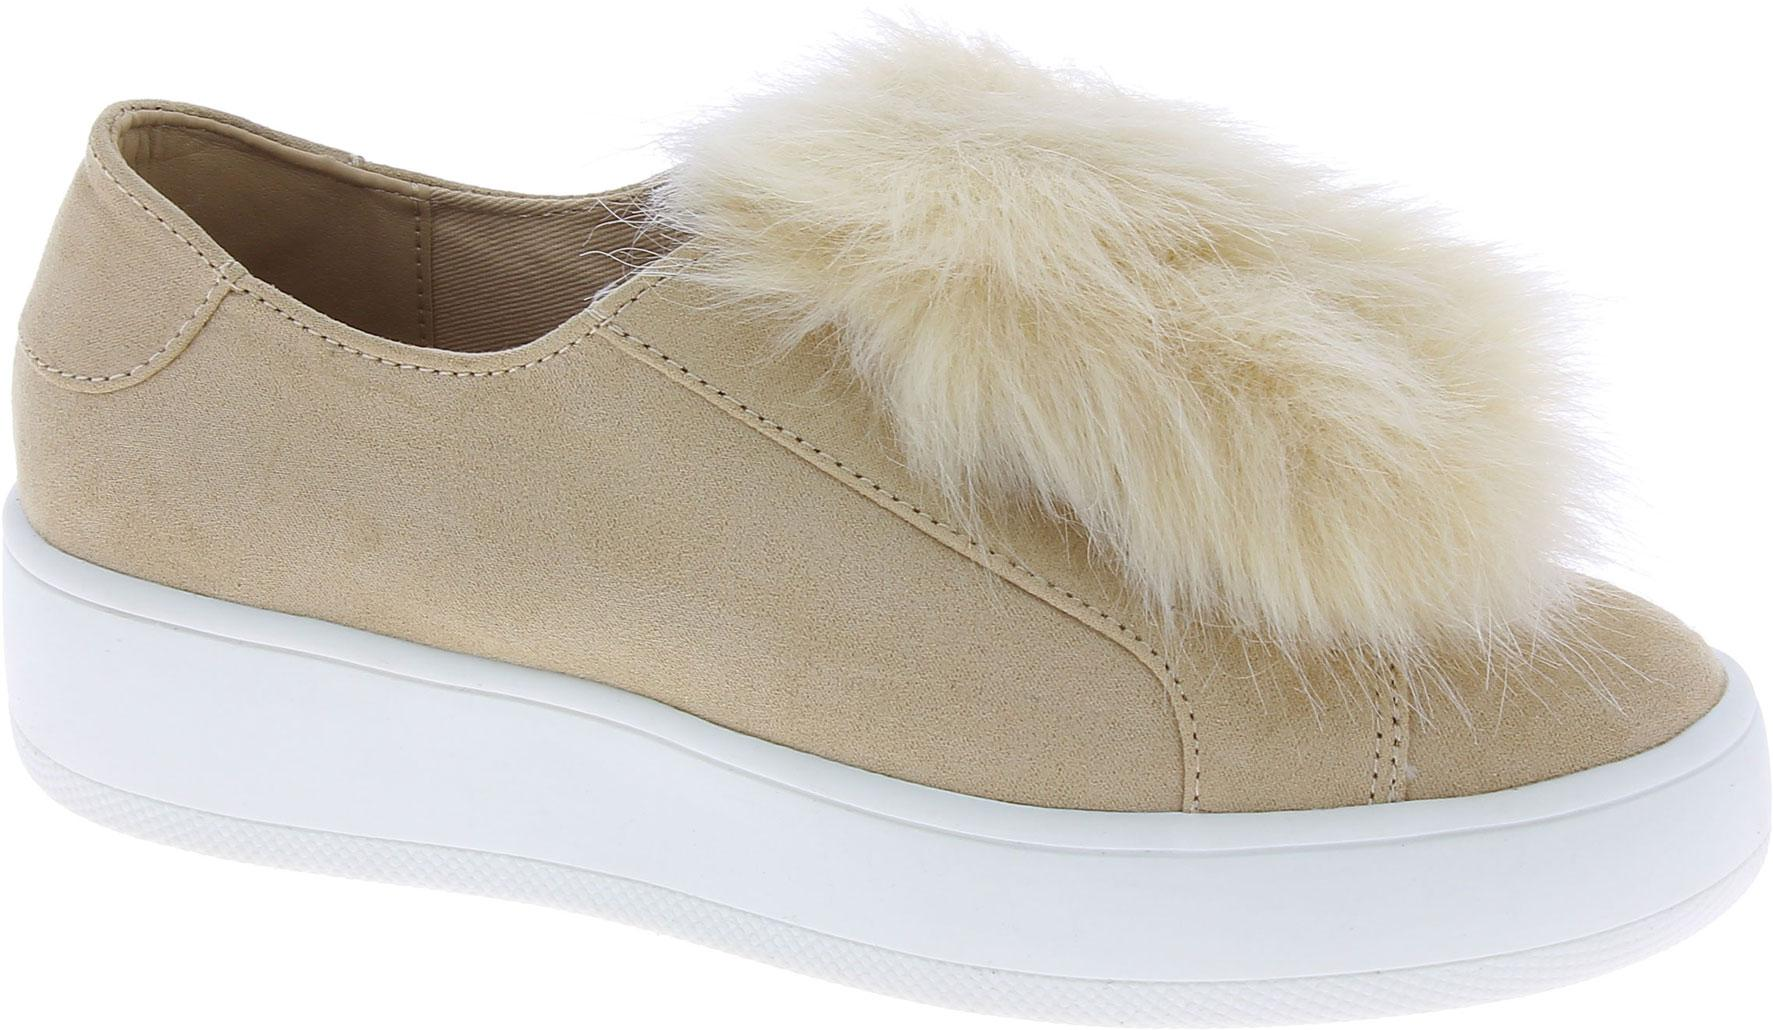 e45f6153285 Steve Madden Women's platform laceless sneakers beige suede leather ...